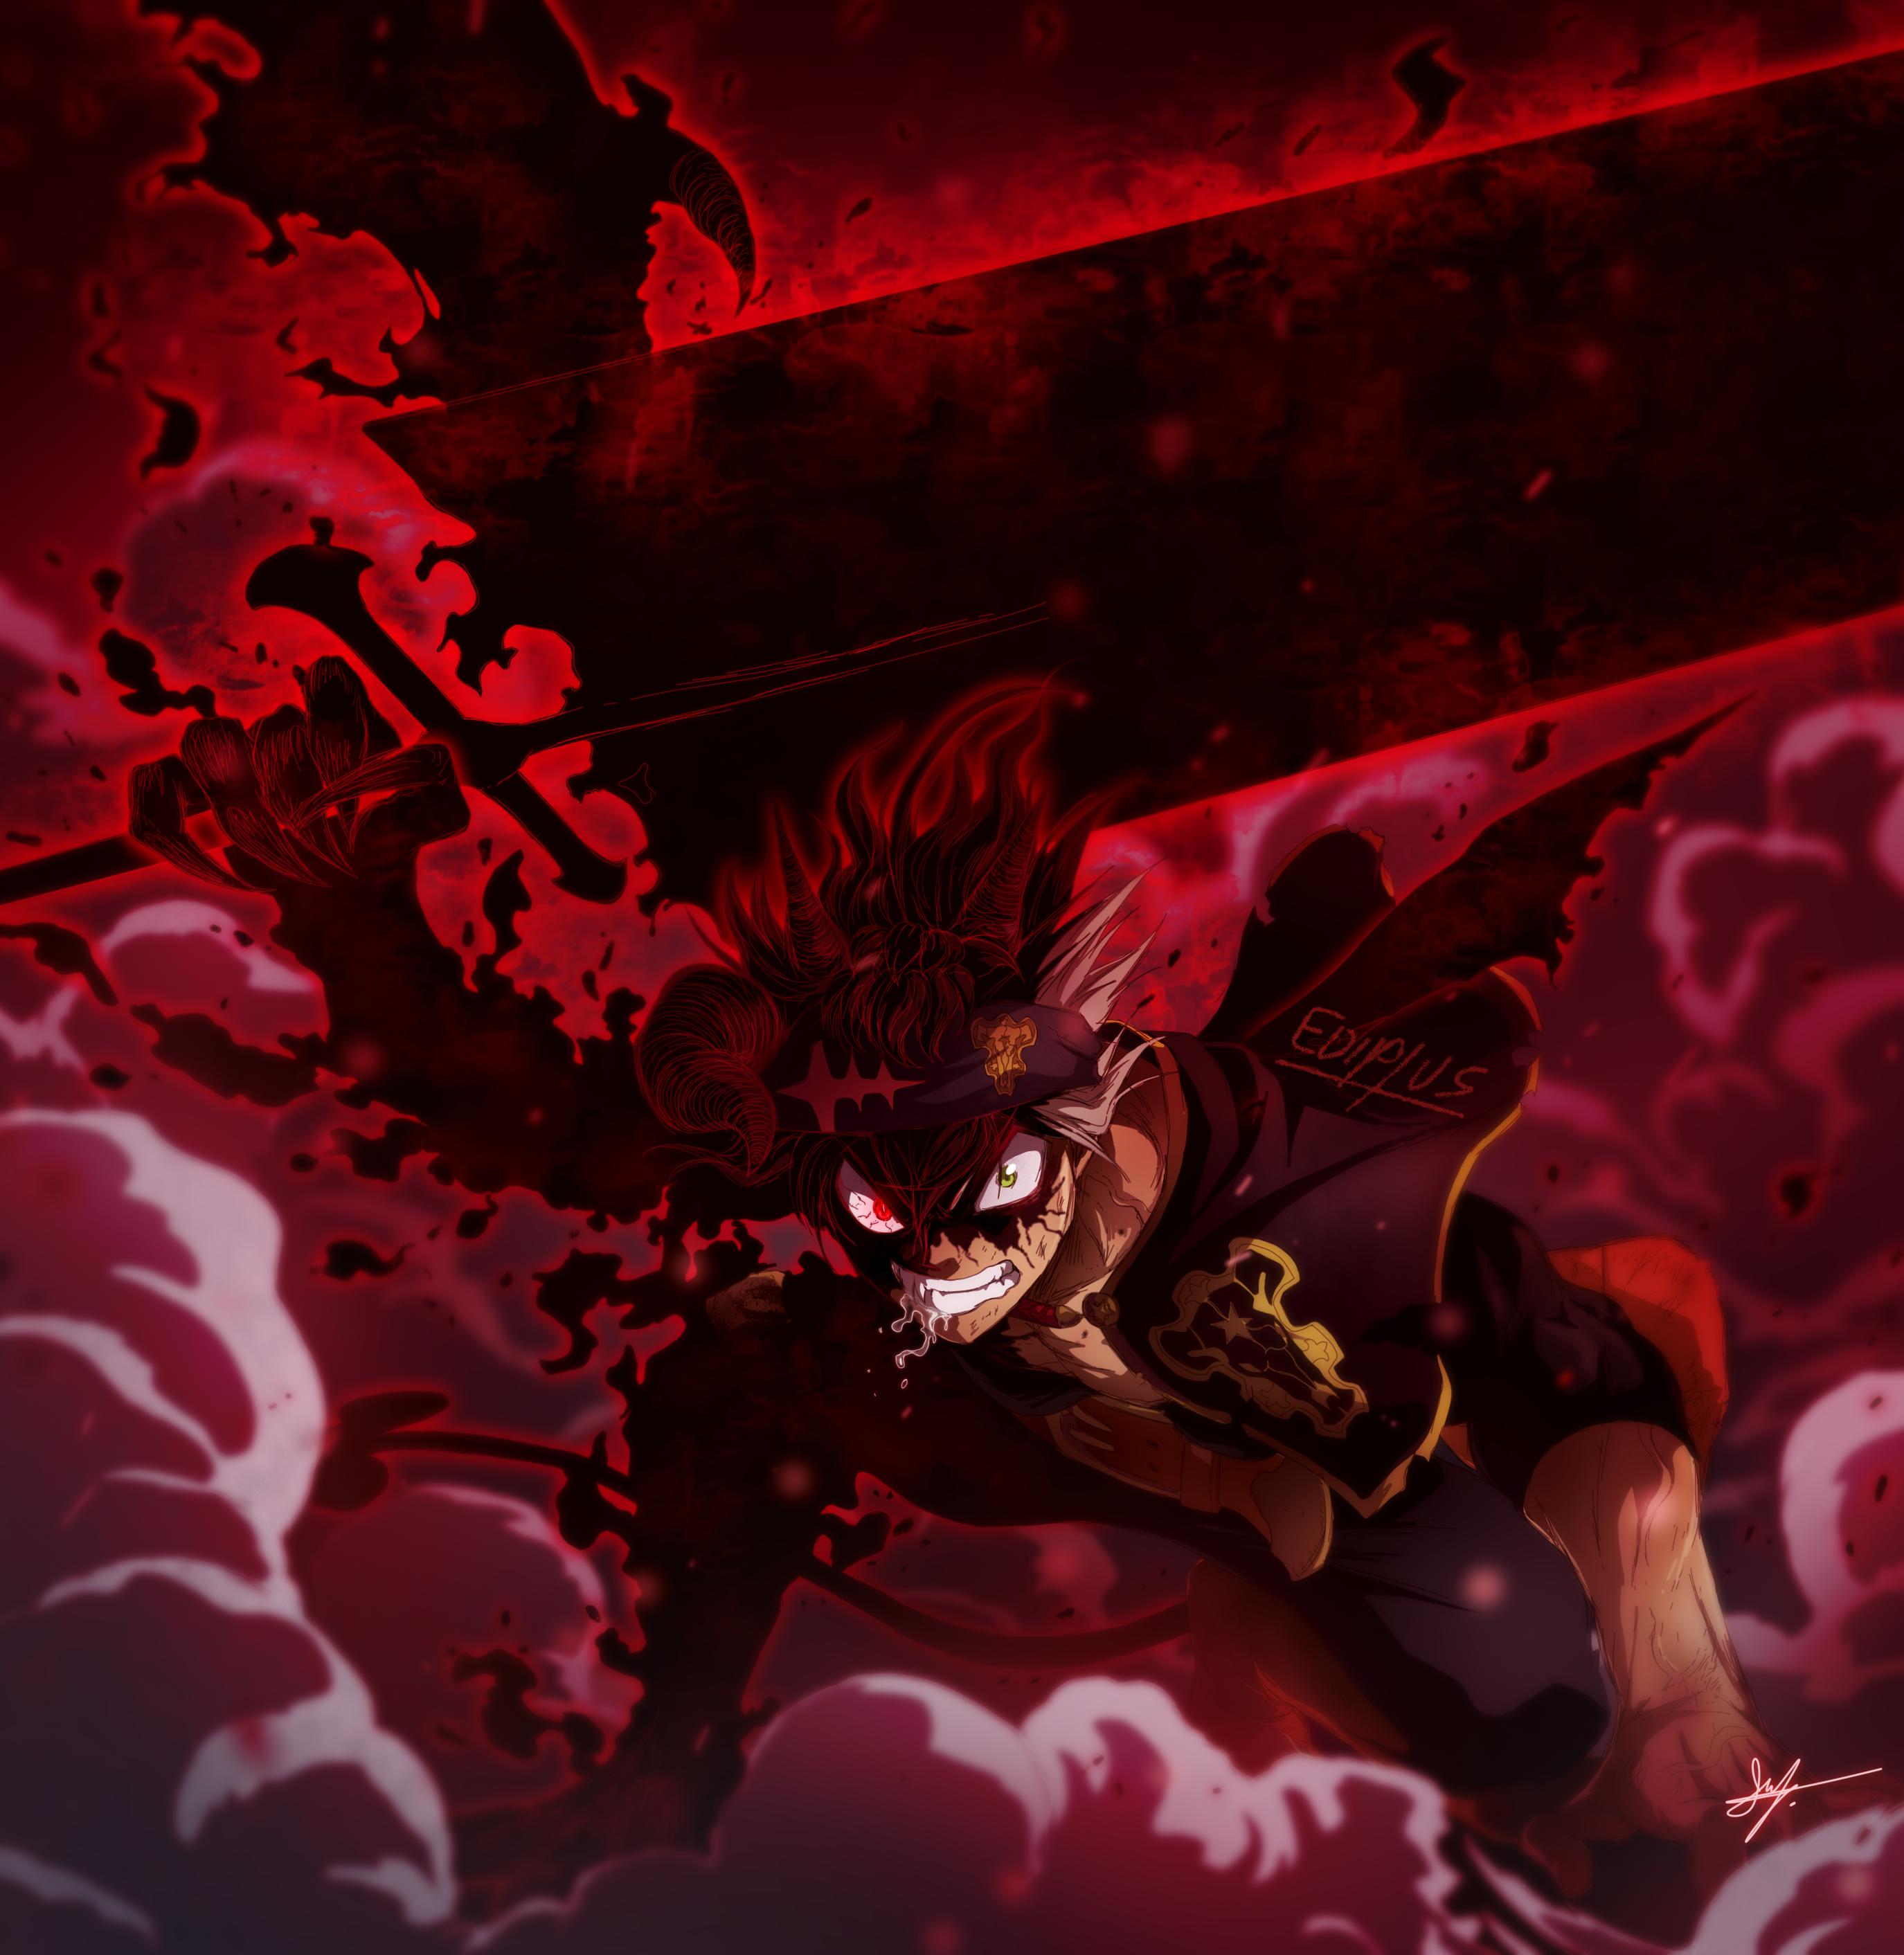 Asta Black Clover Capitulo 242 Manga Black Clover Anime Black Clover Manga Dark Anime